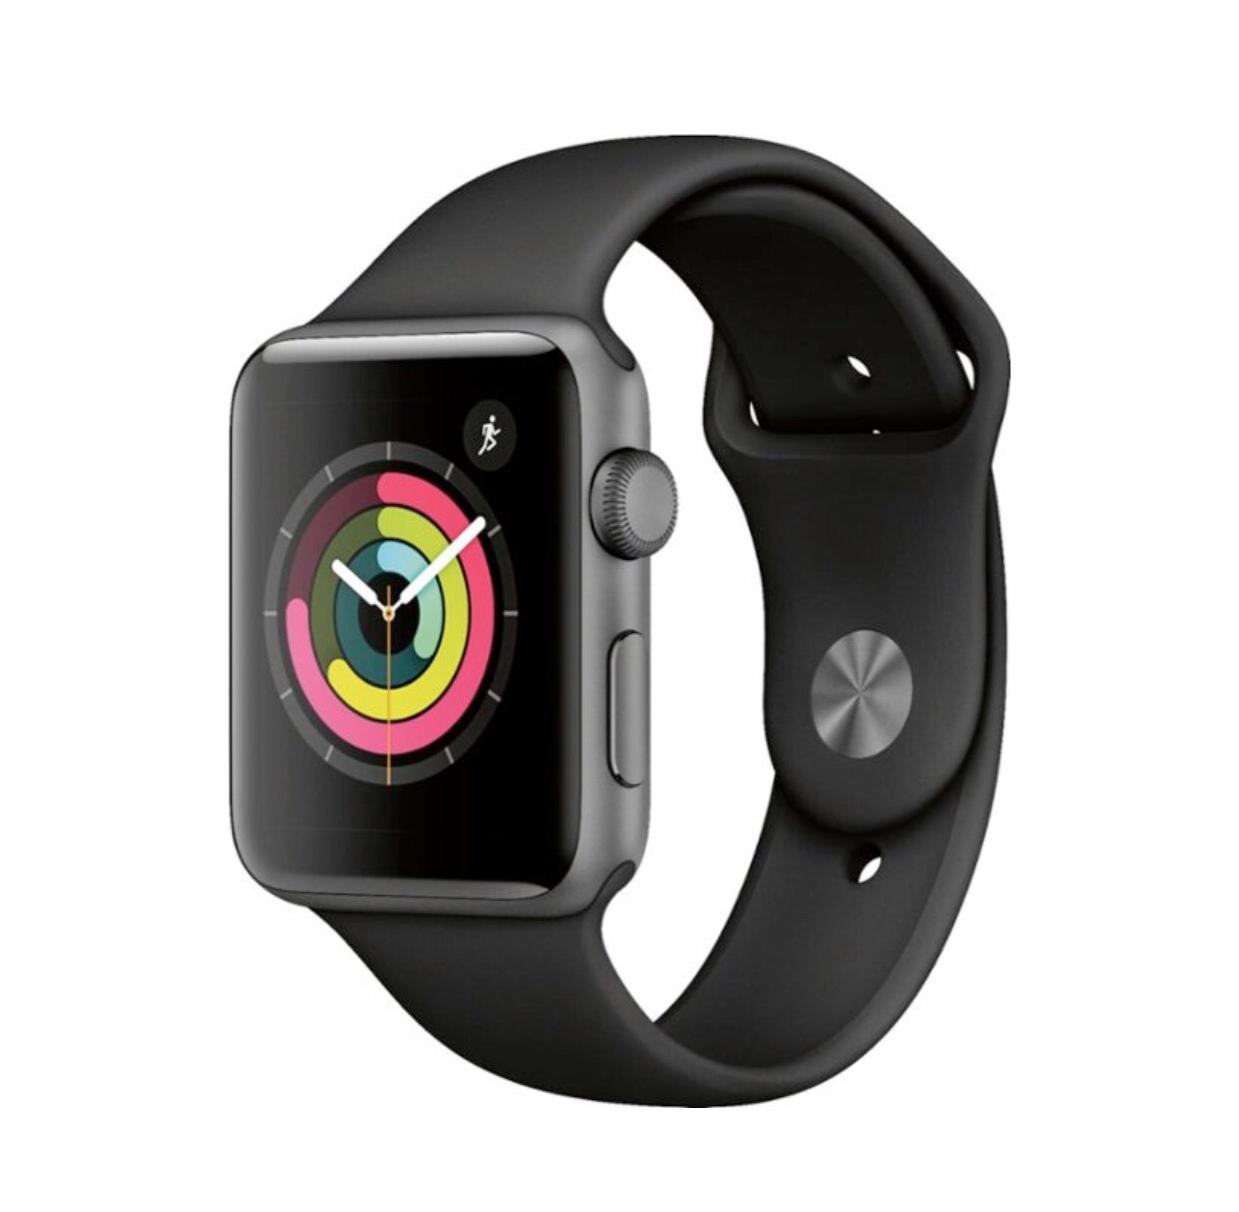 Wholesale Apple Watch Series 3 (GPS) 42mm Space Gray Aluminum Case - Black Sport Band